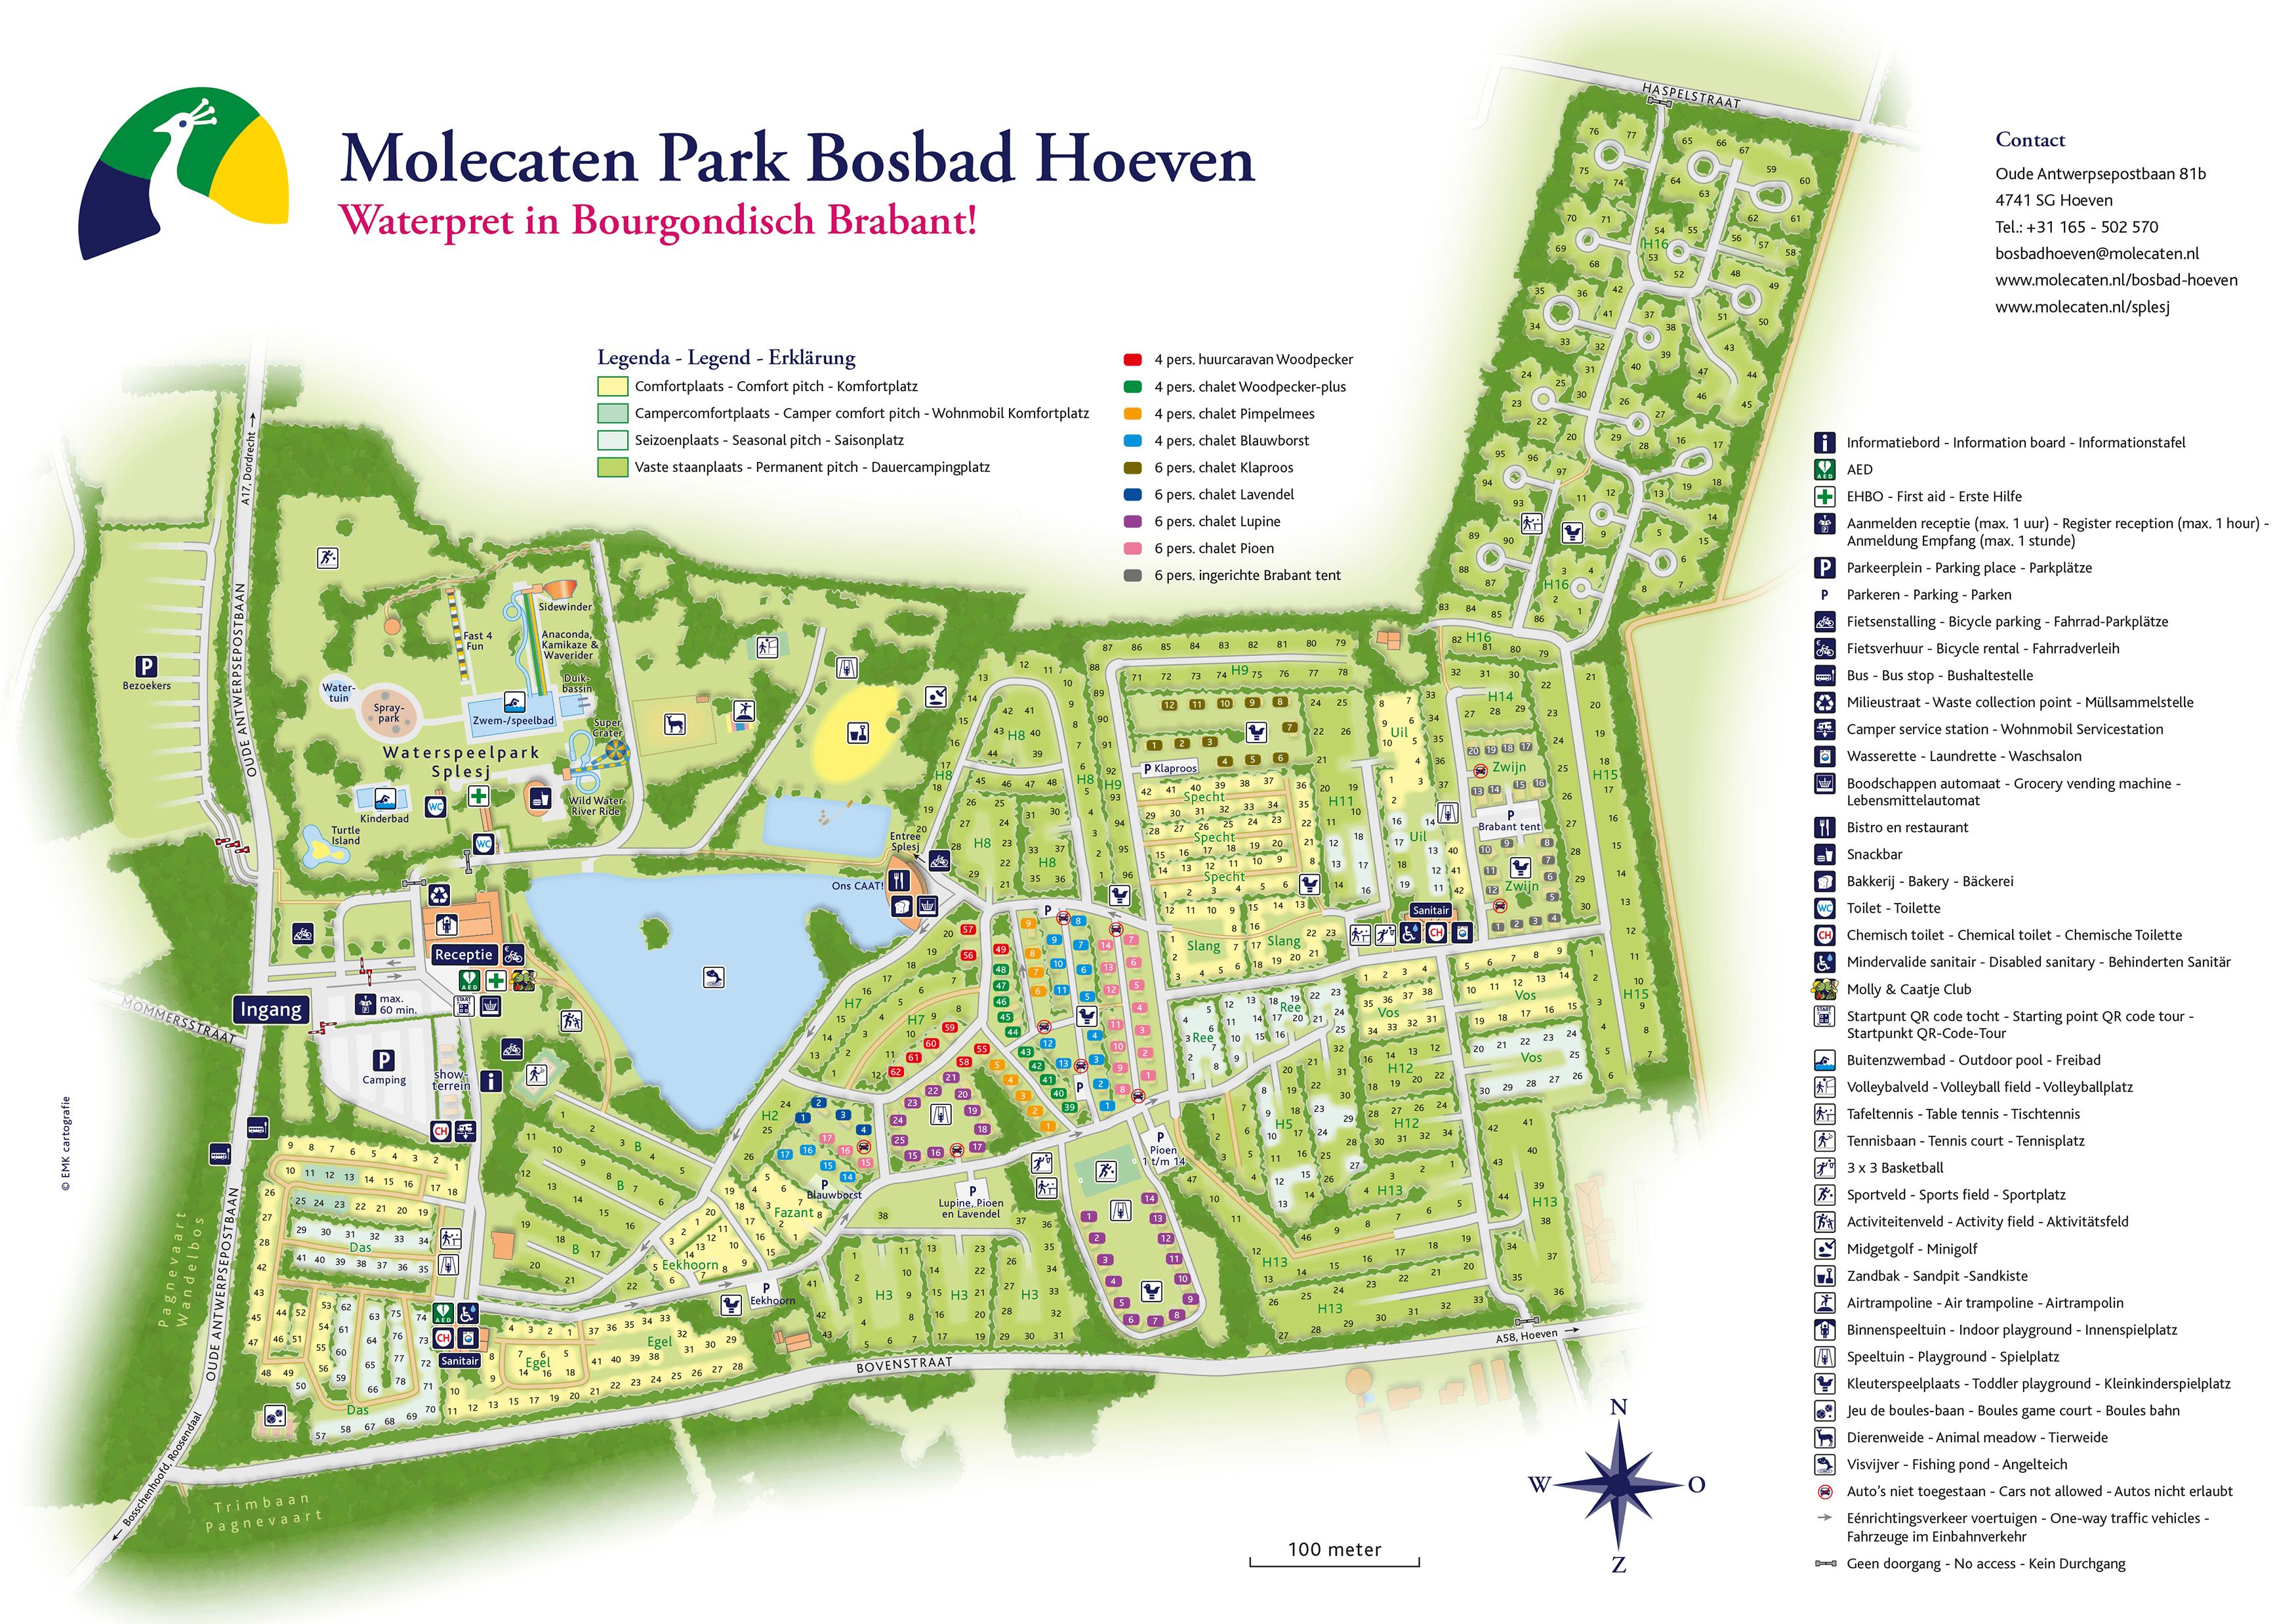 Molecaten Park Bosbad Hoeven accommodation.parkmap.alttext